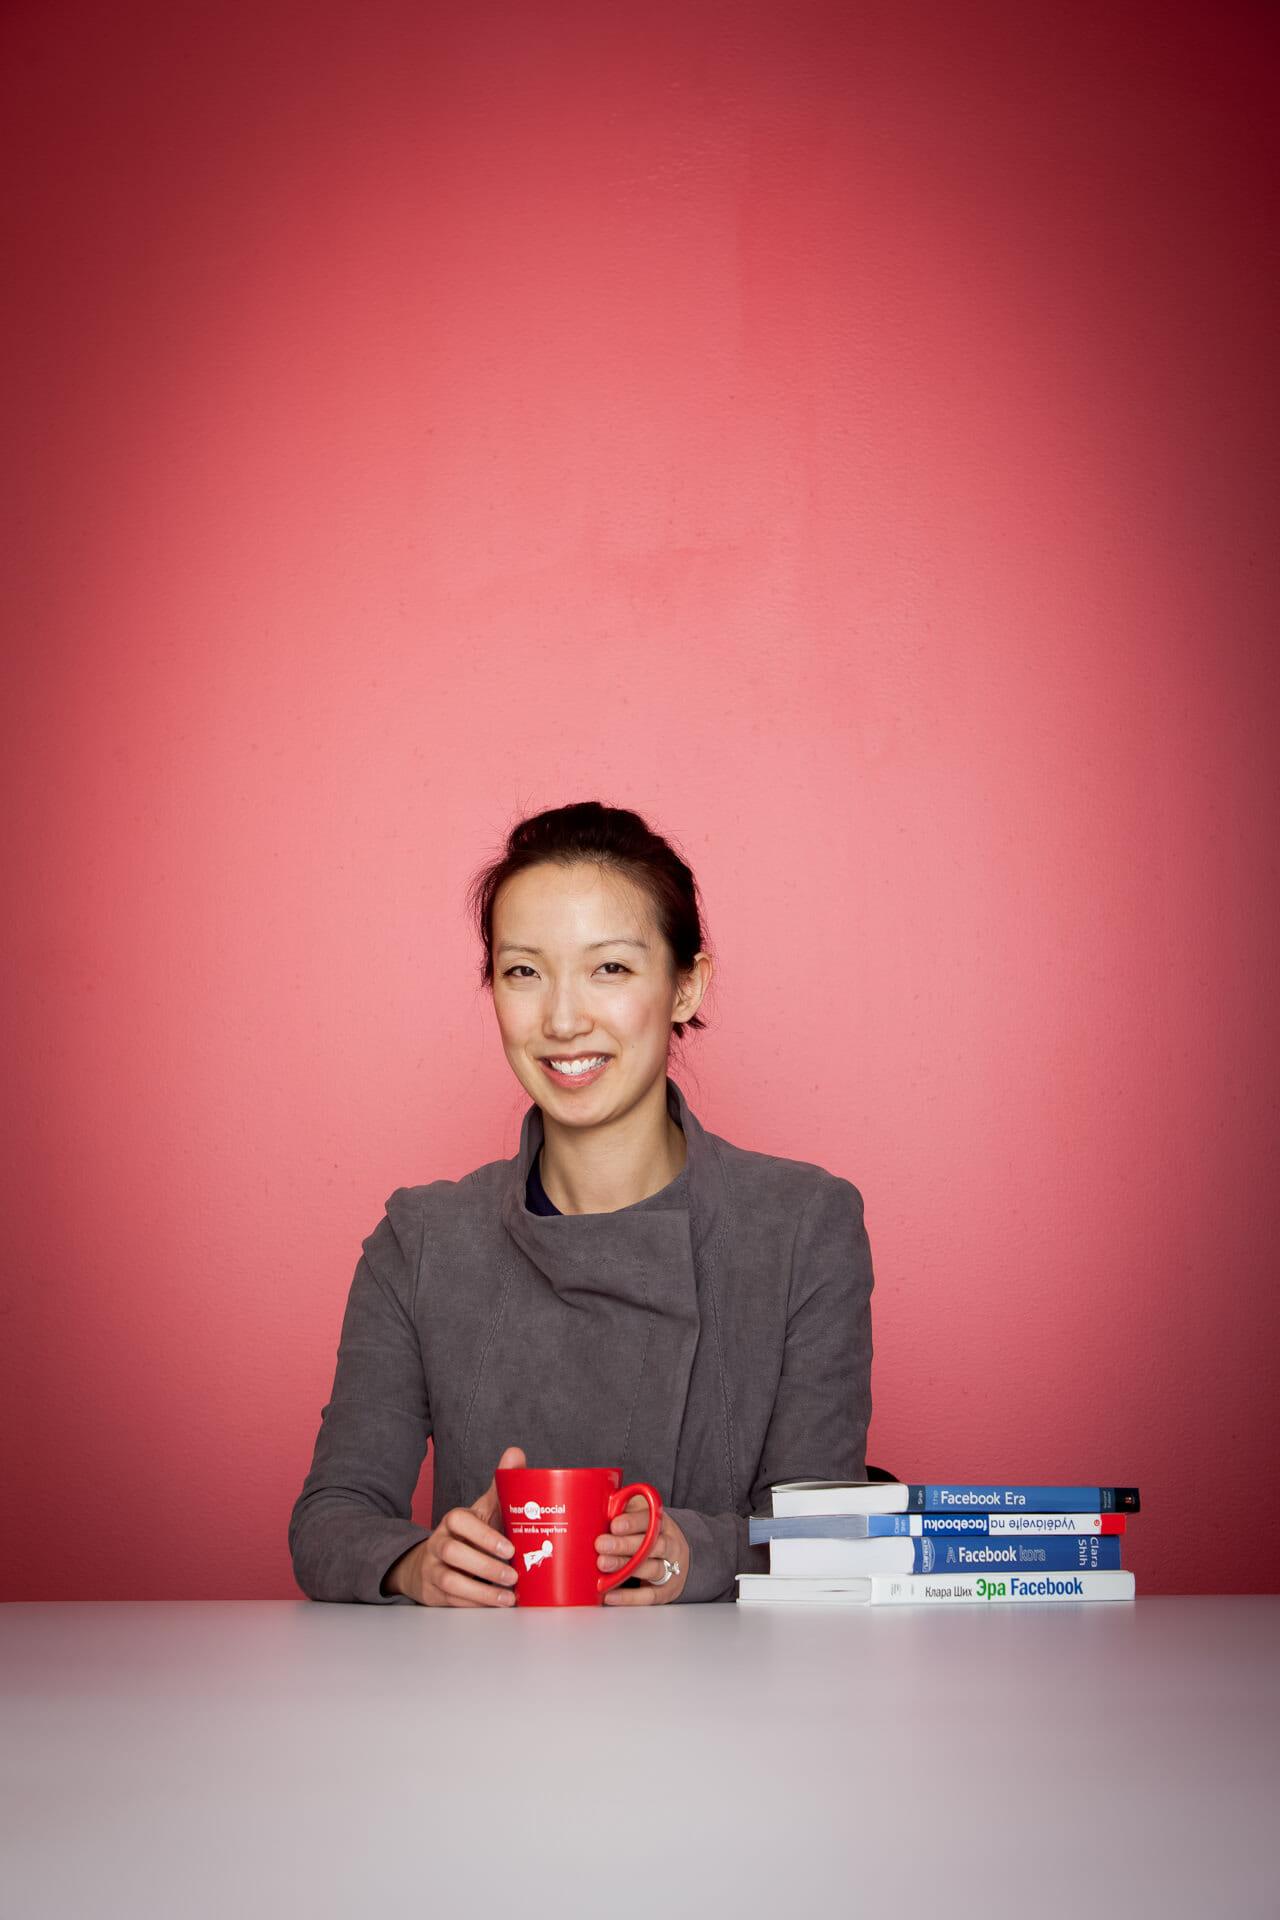 Clara Shih - Hear Say Social - SOMA Magazine shoot - San Francisco, CA, USA